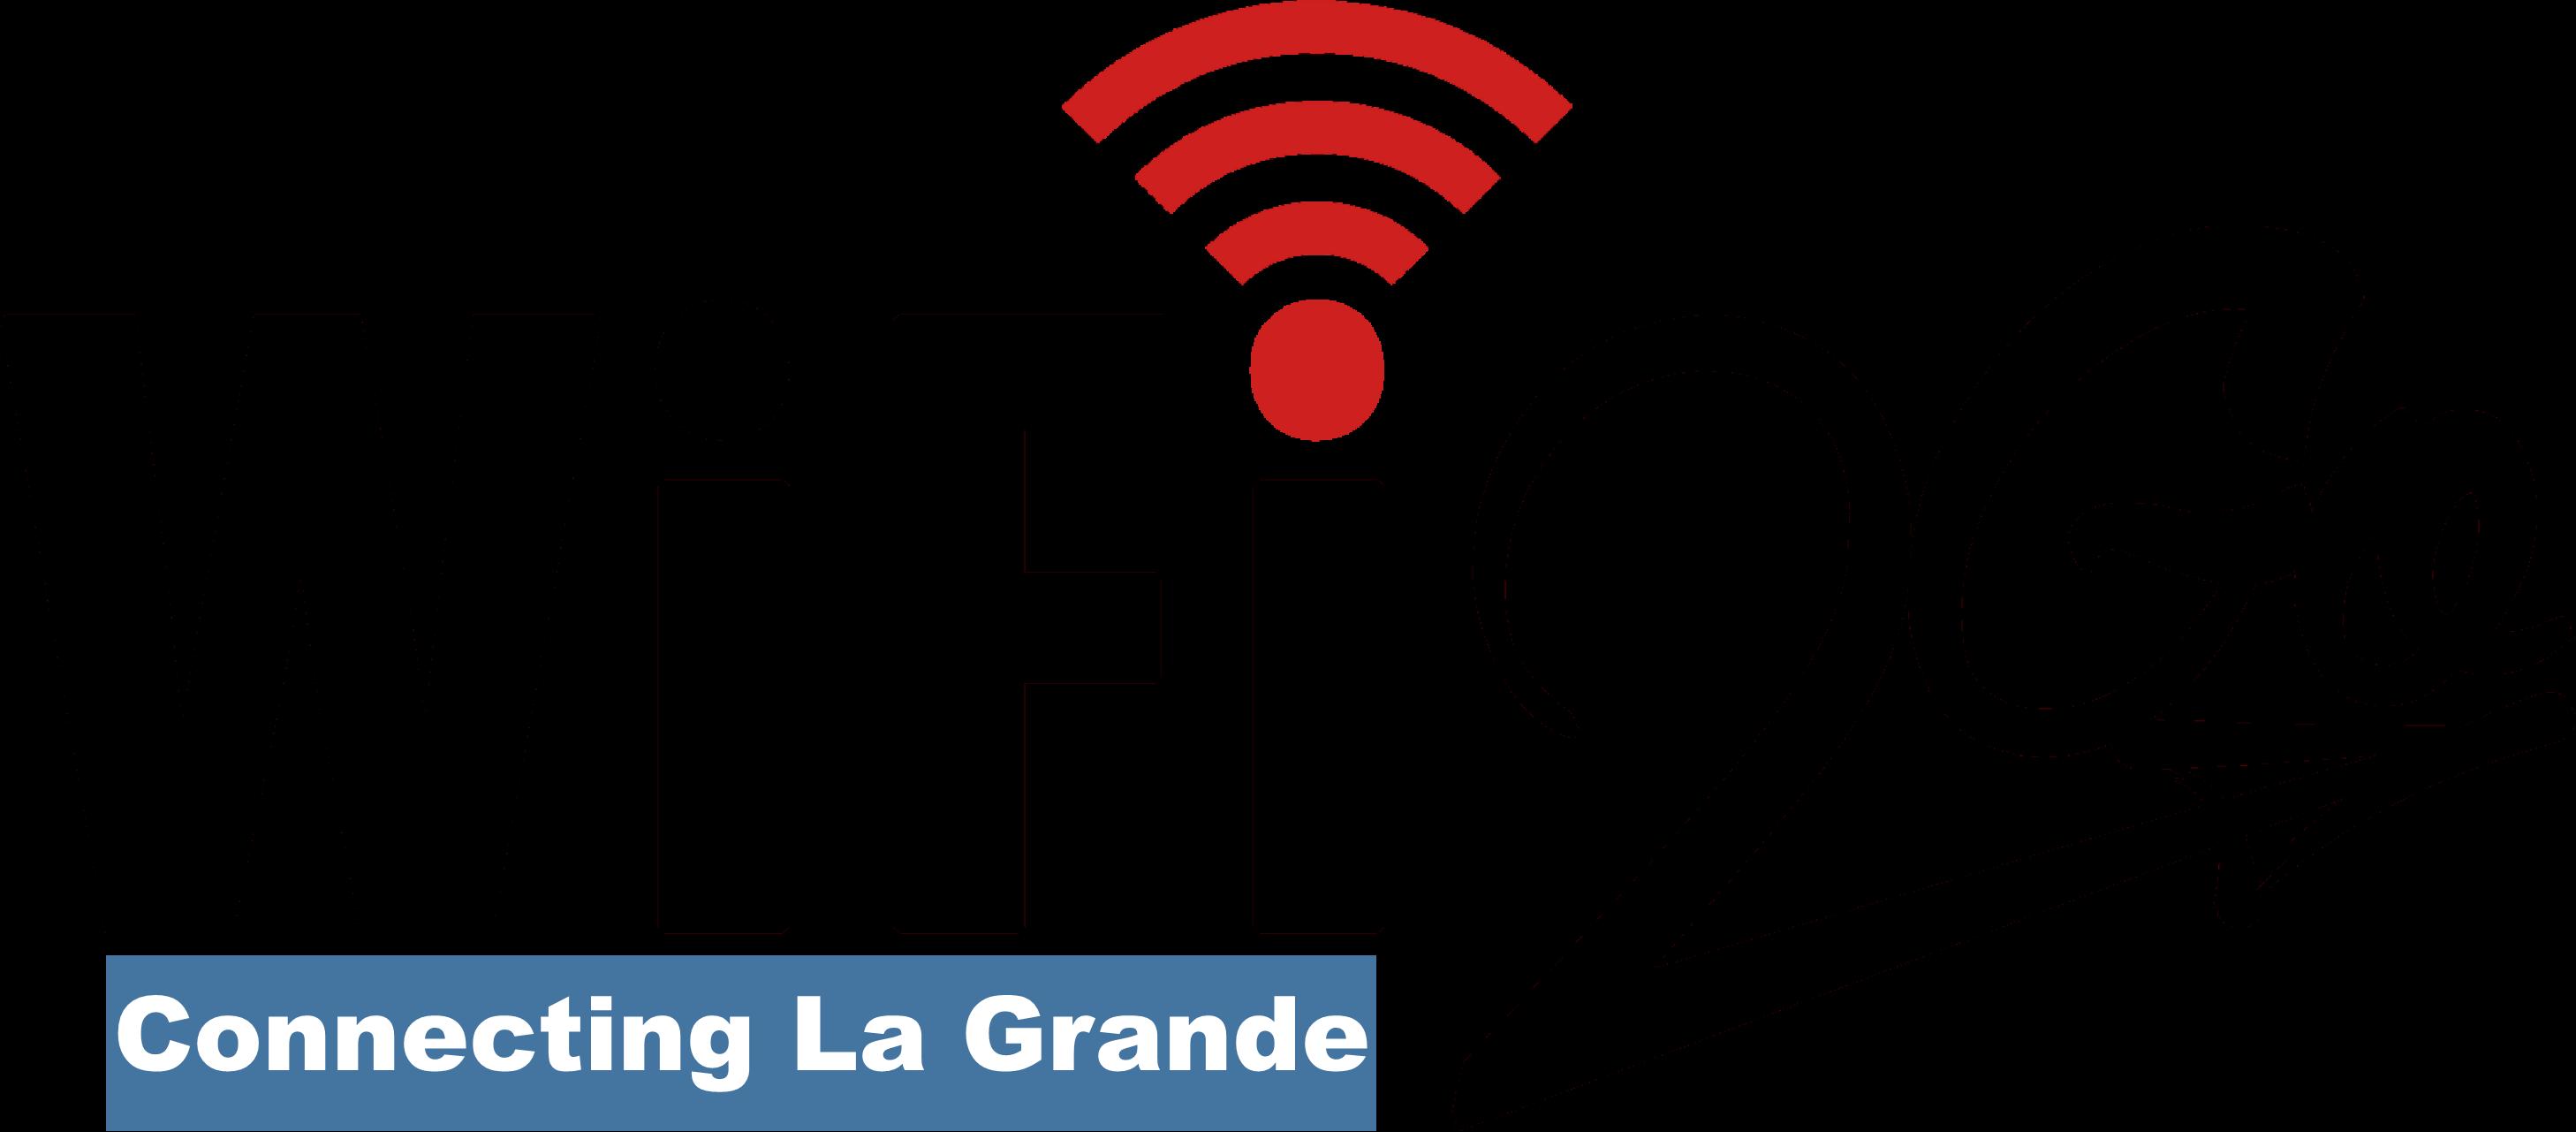 WiFi Hotspot image